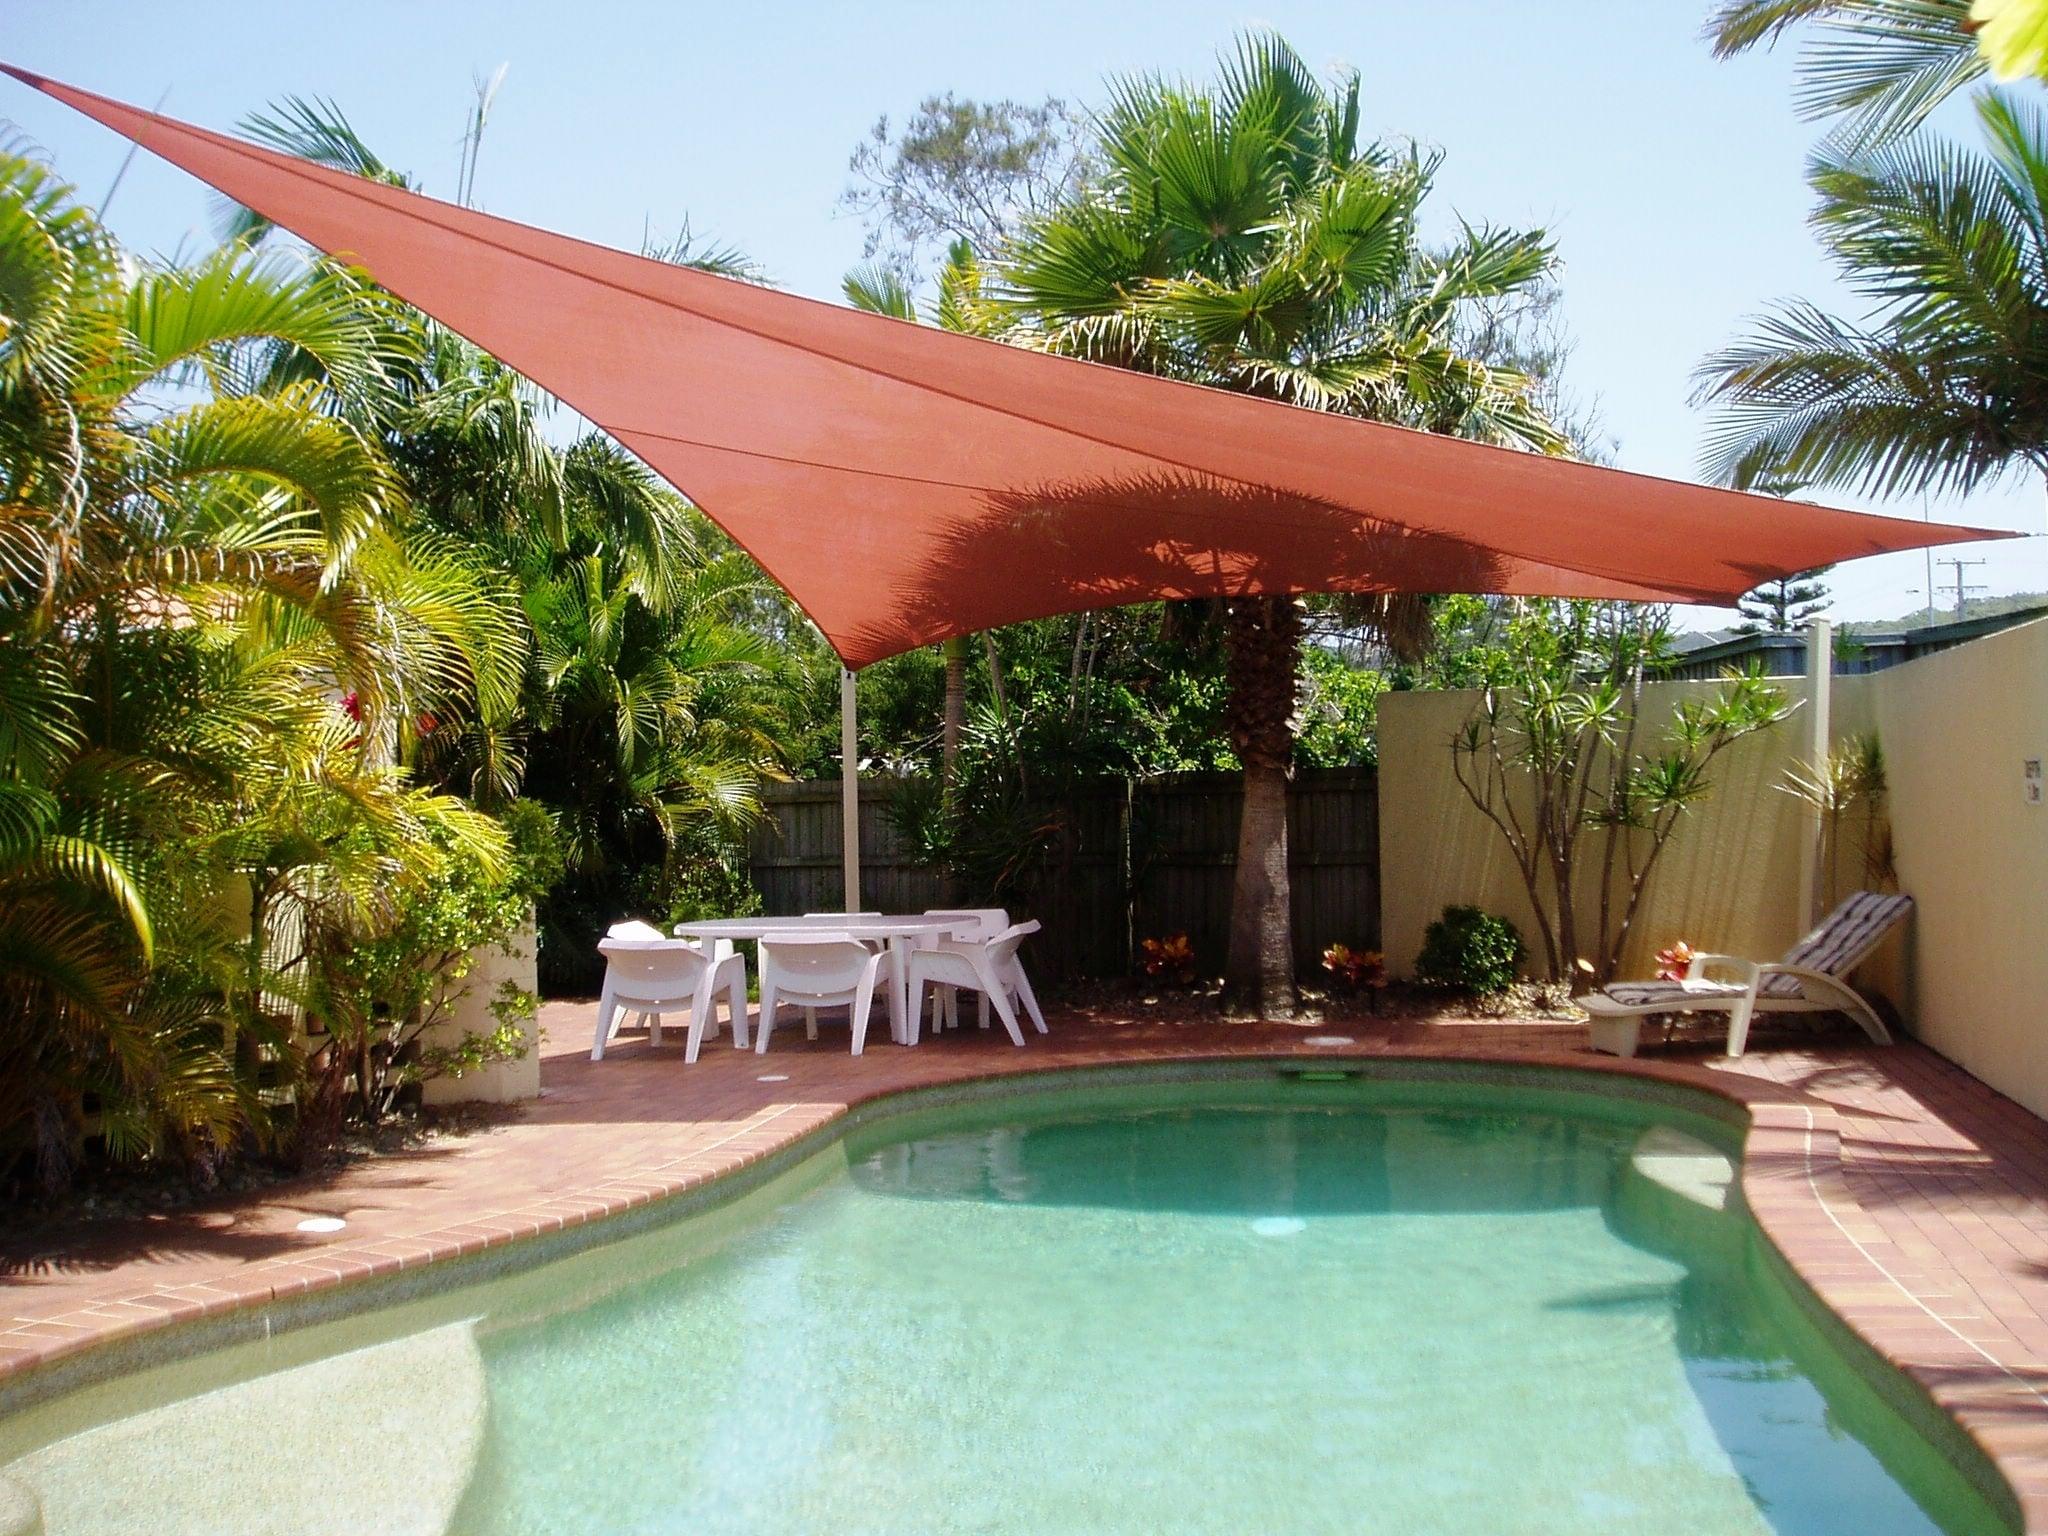 Sun Structure Shade Sails Palm Beach